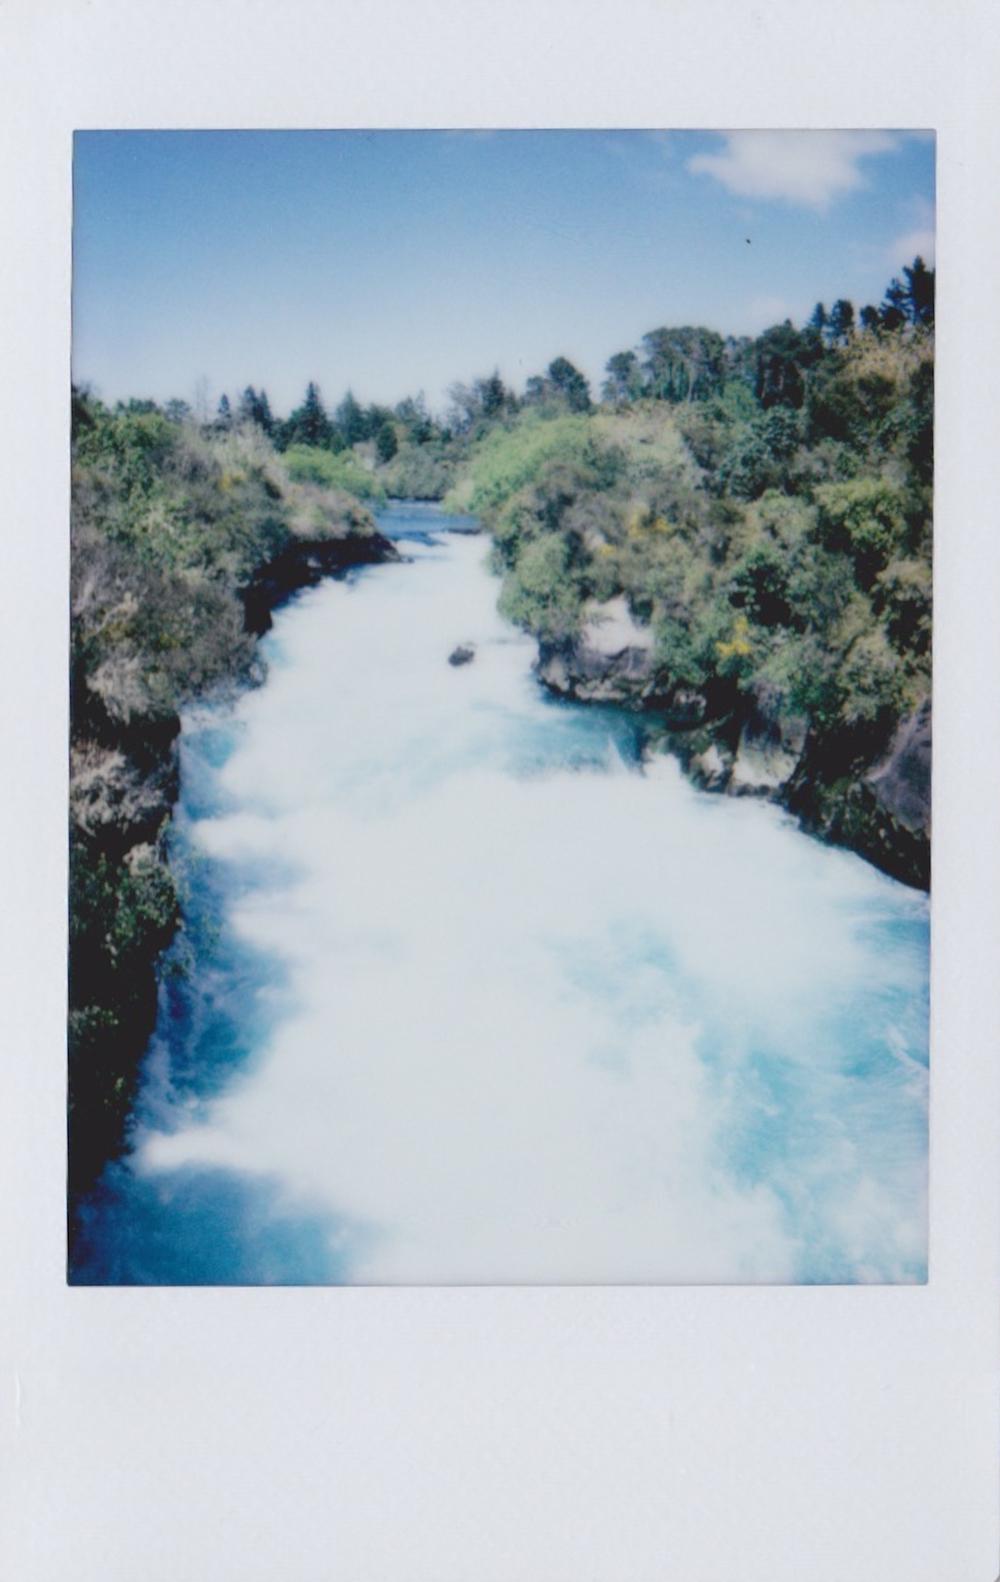 Izzie Rae Photography New Zealand polaroid